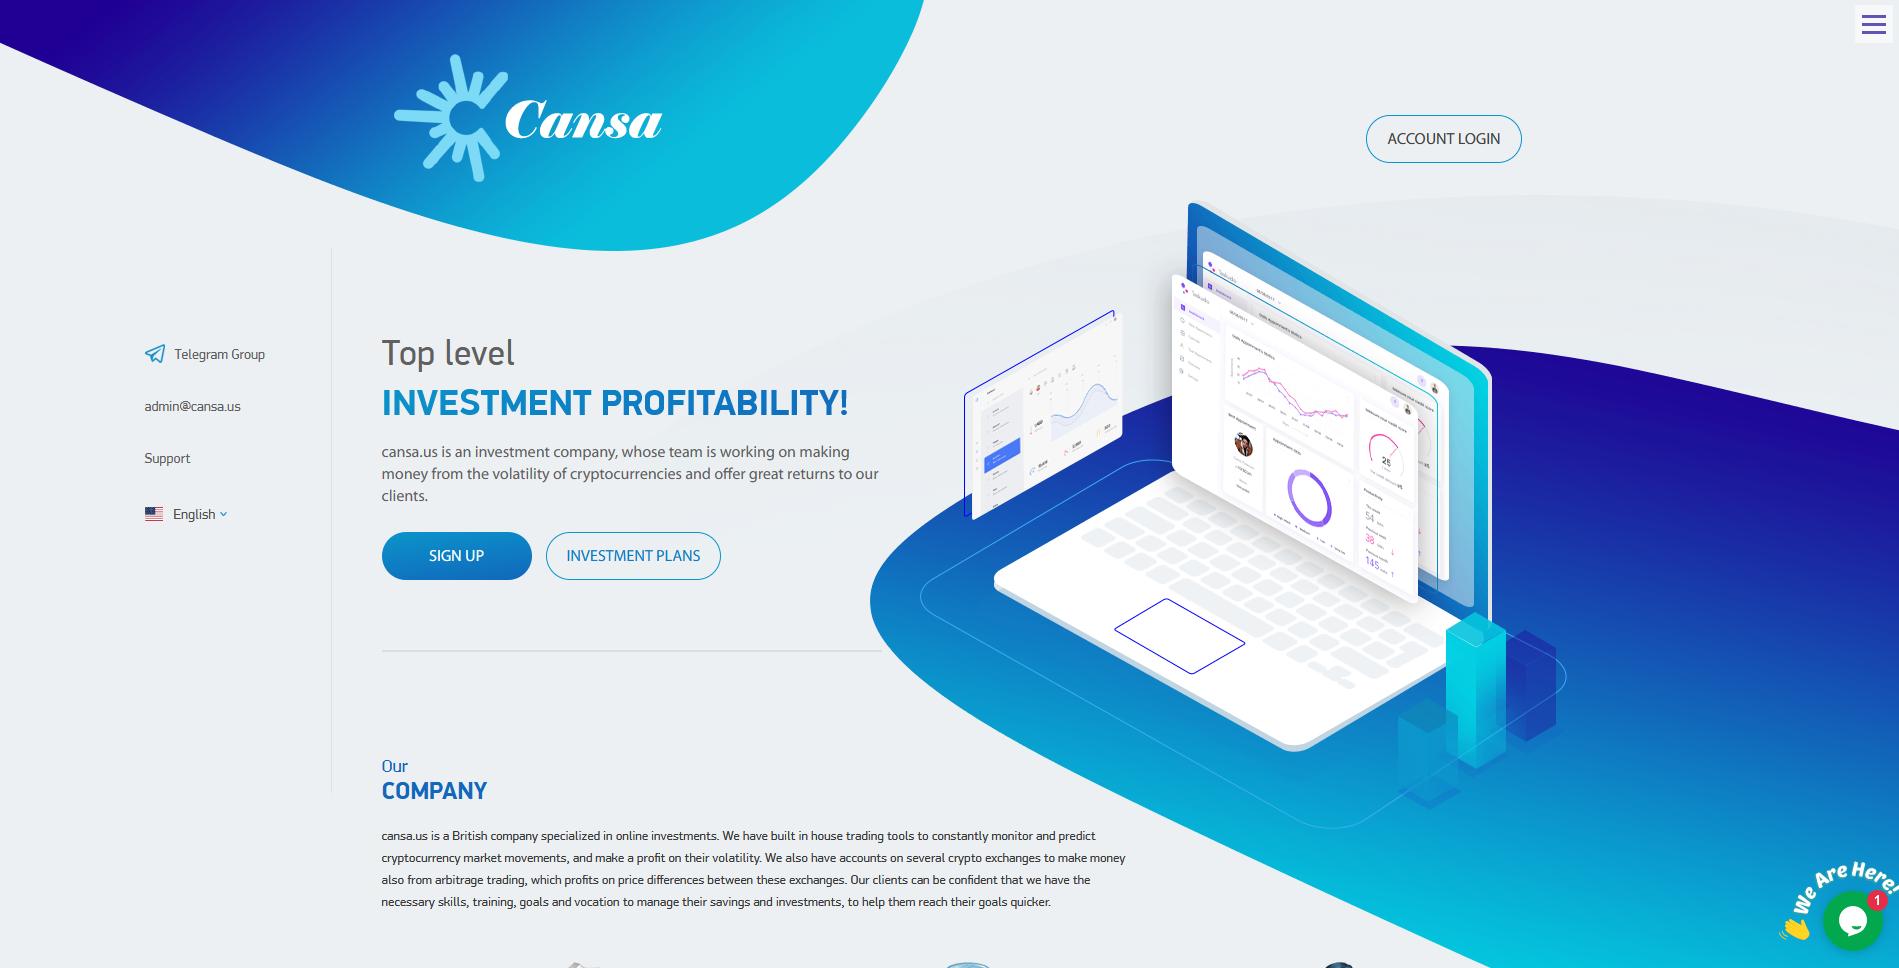 Cansa Ltd